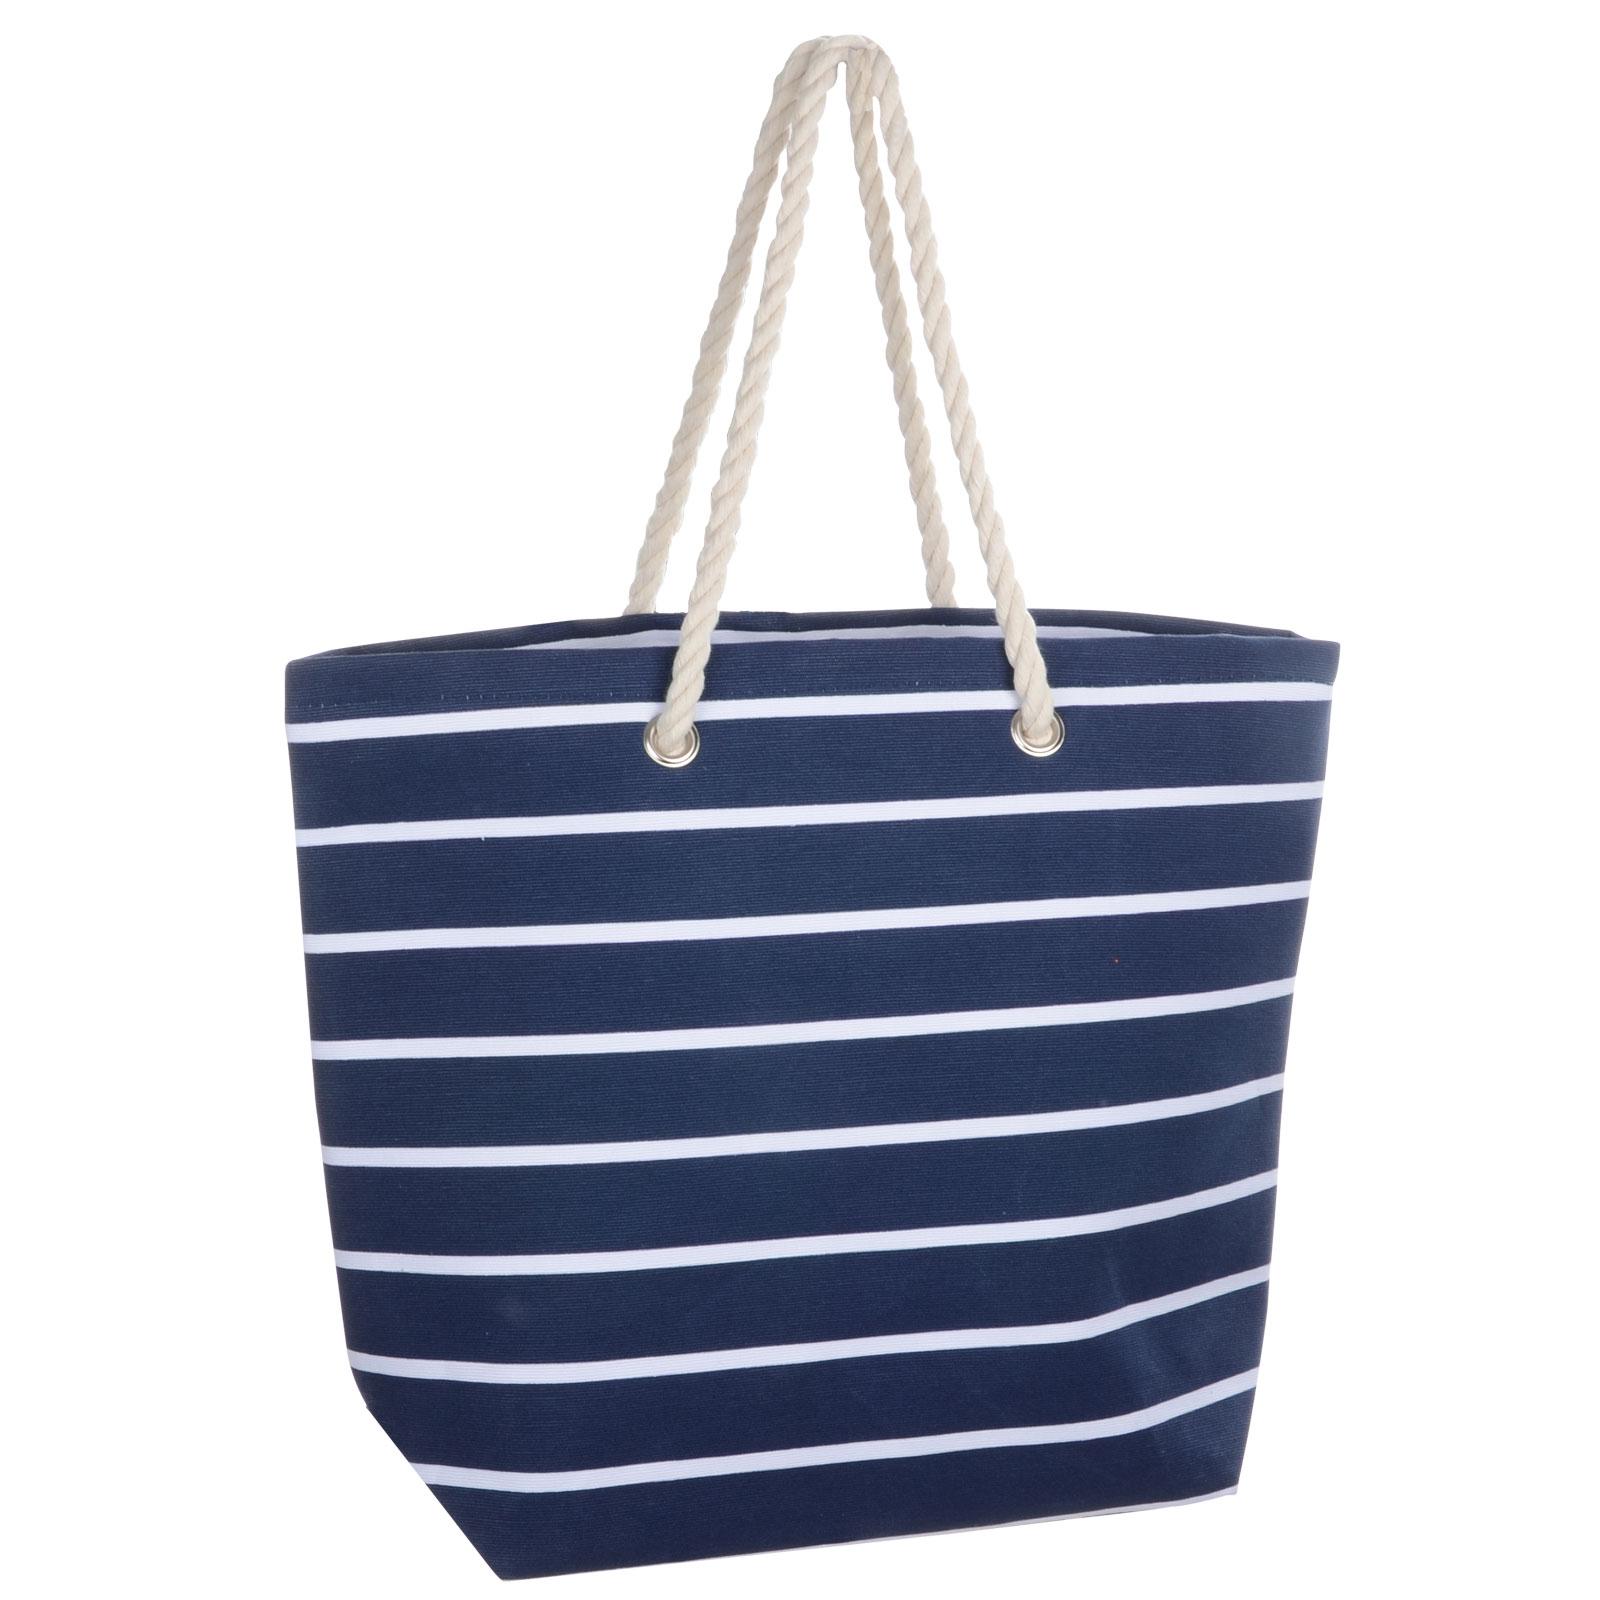 Ladies Large Stripe Canvas Beach Shoulder Bag Tote Shopping Reuseable Handbag